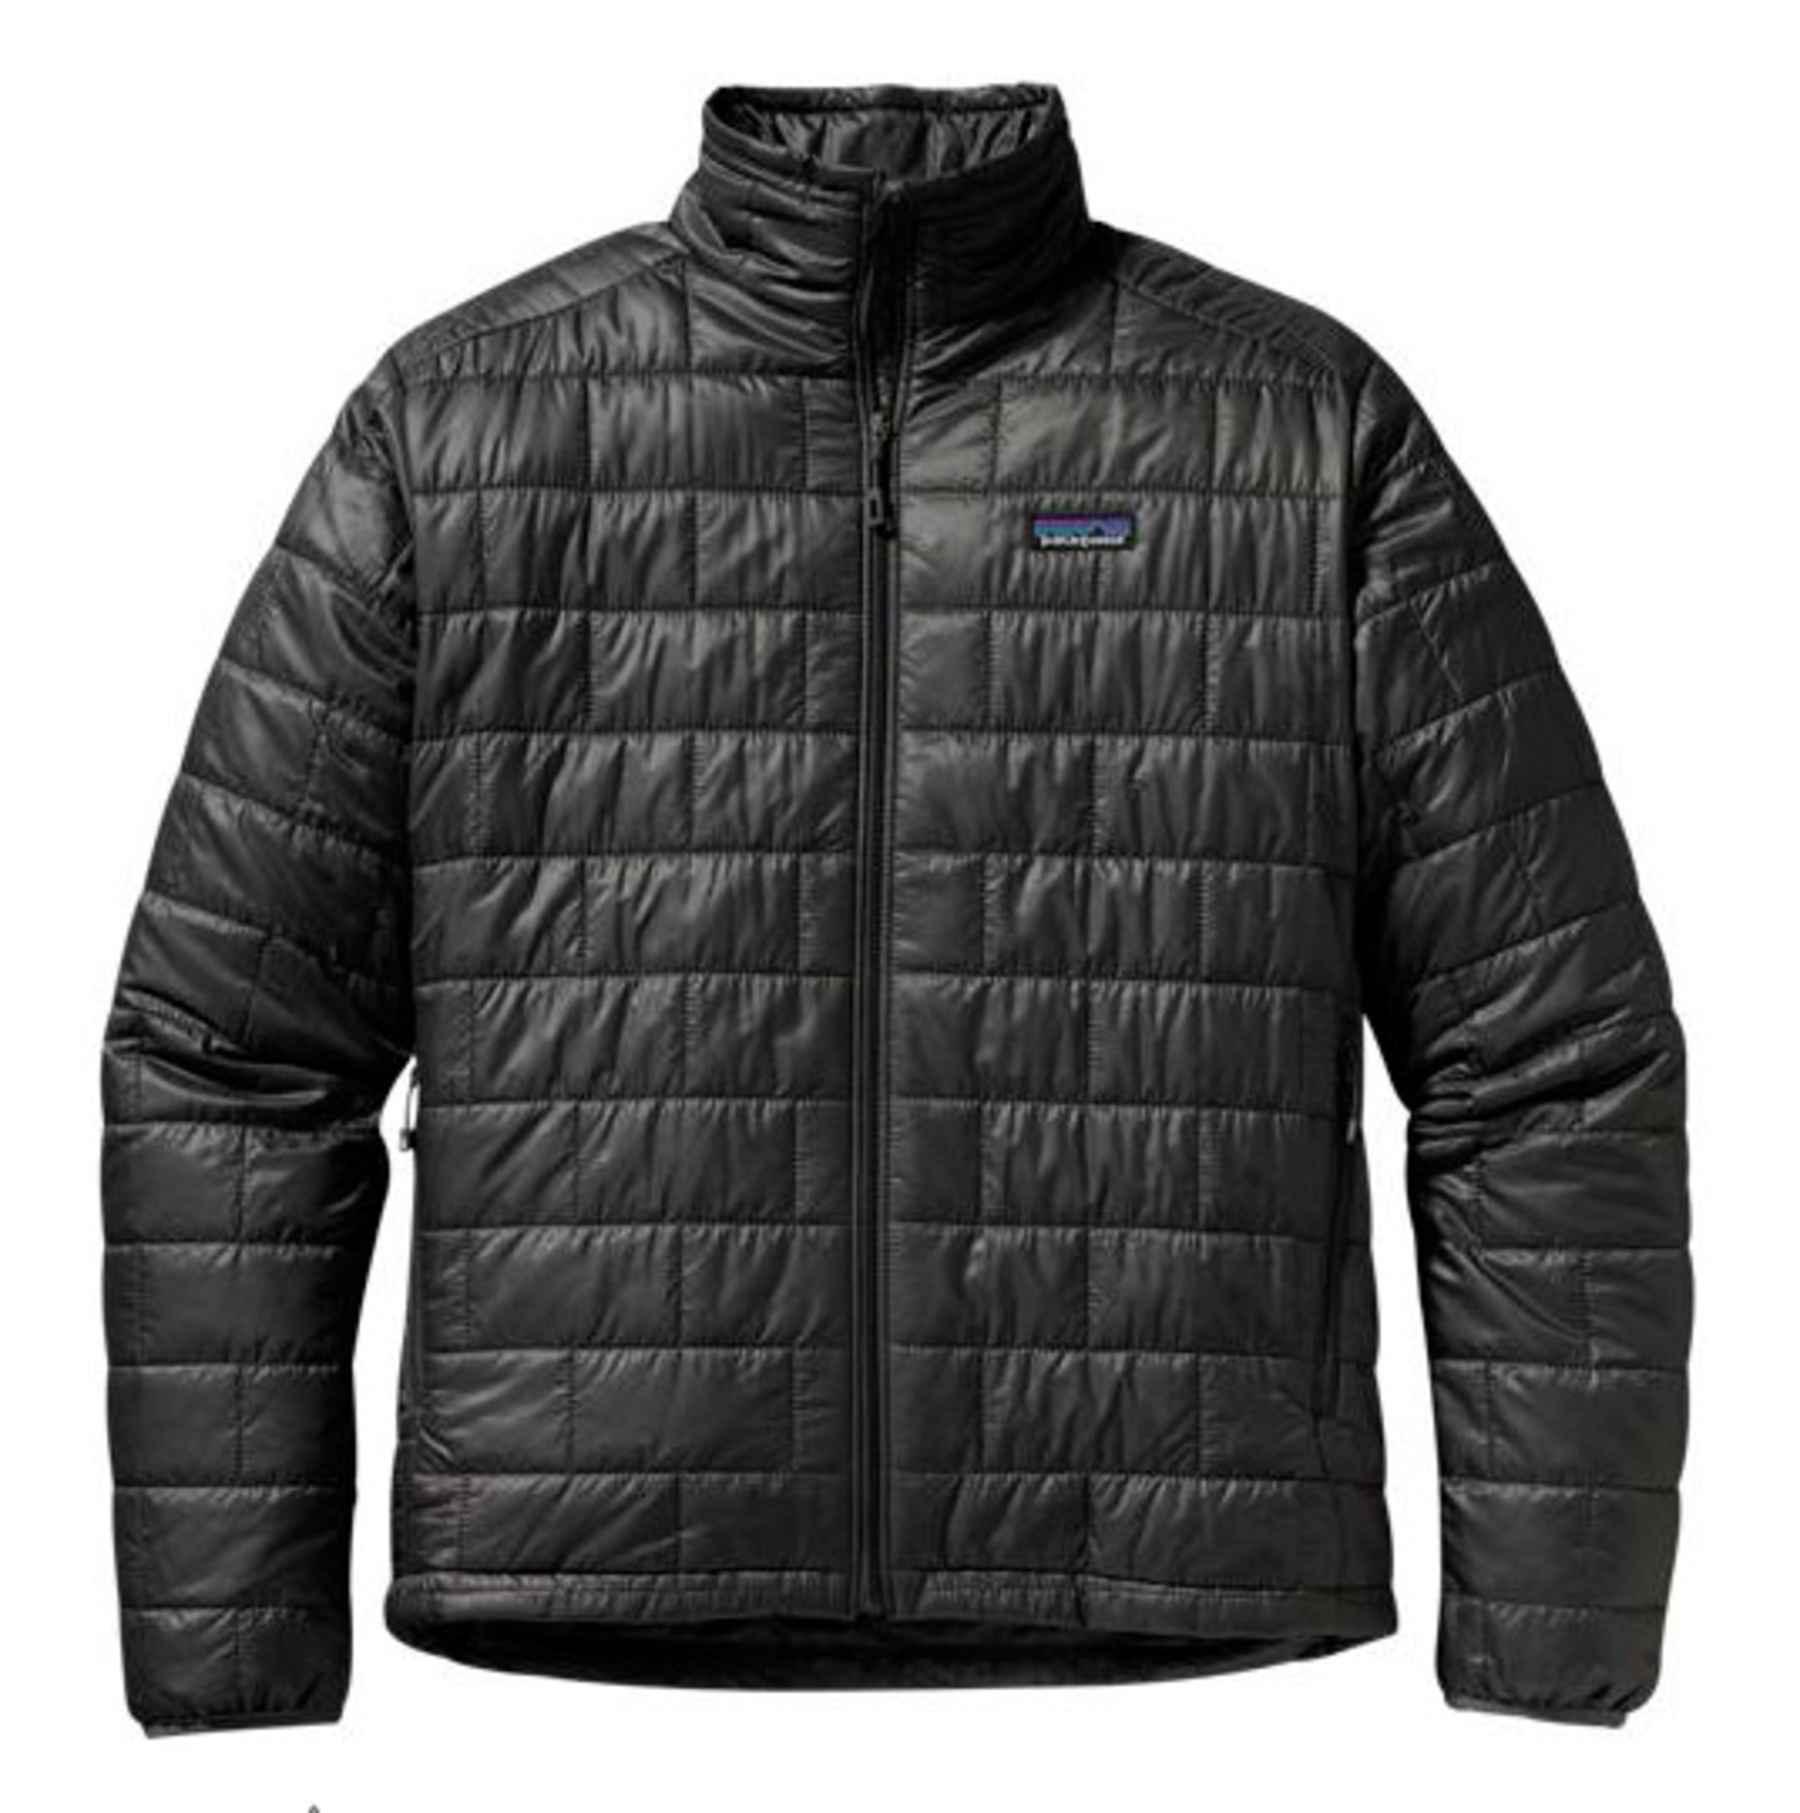 Yellowstone SPEY Soft Shell Fleece Mens Water Resist Jacket Black